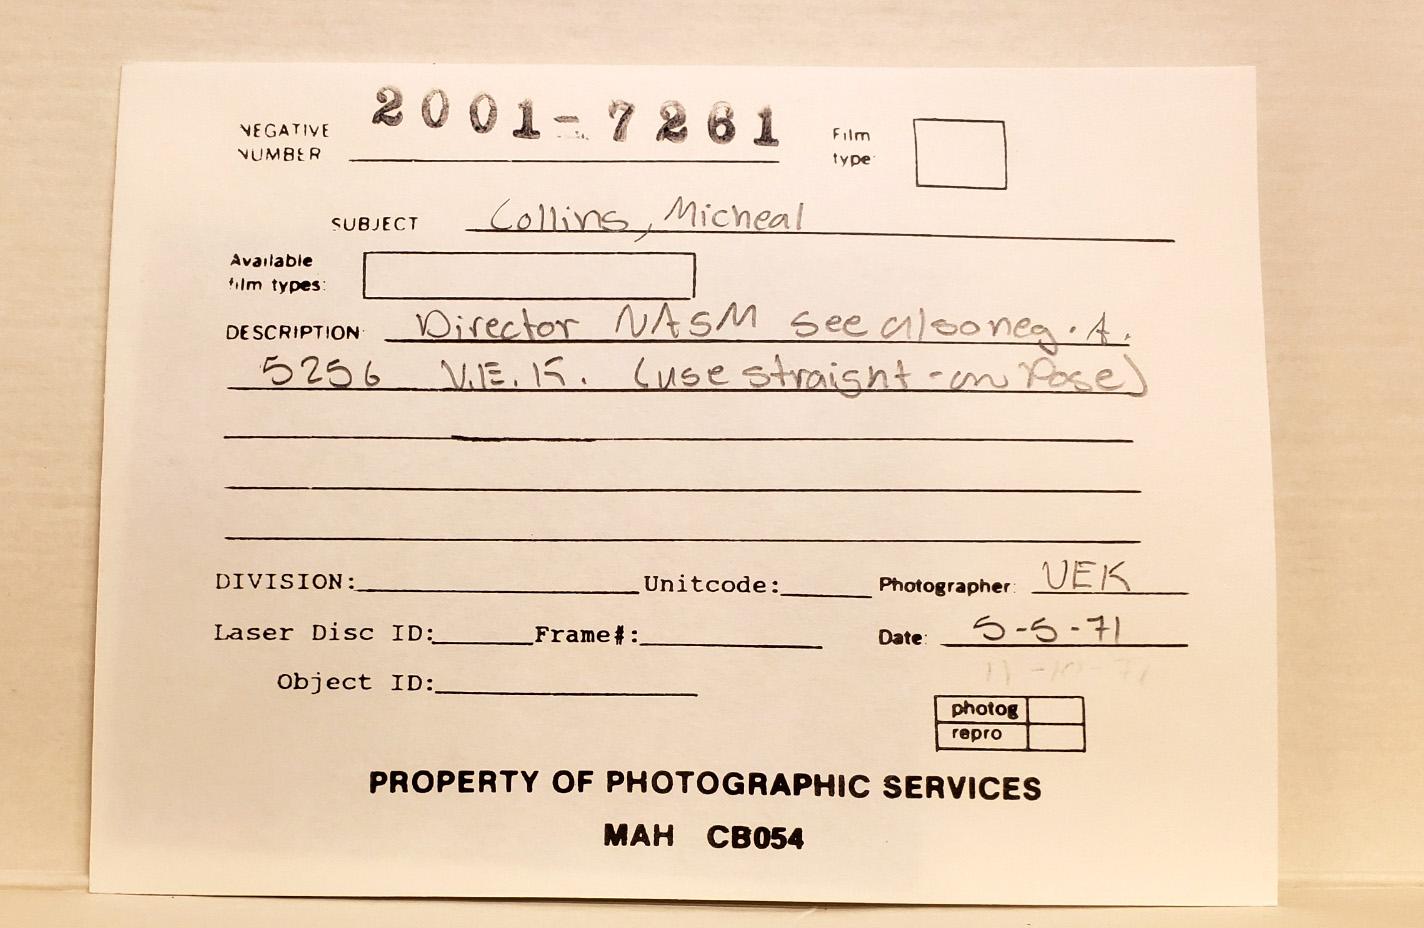 Photographic services catalog record.